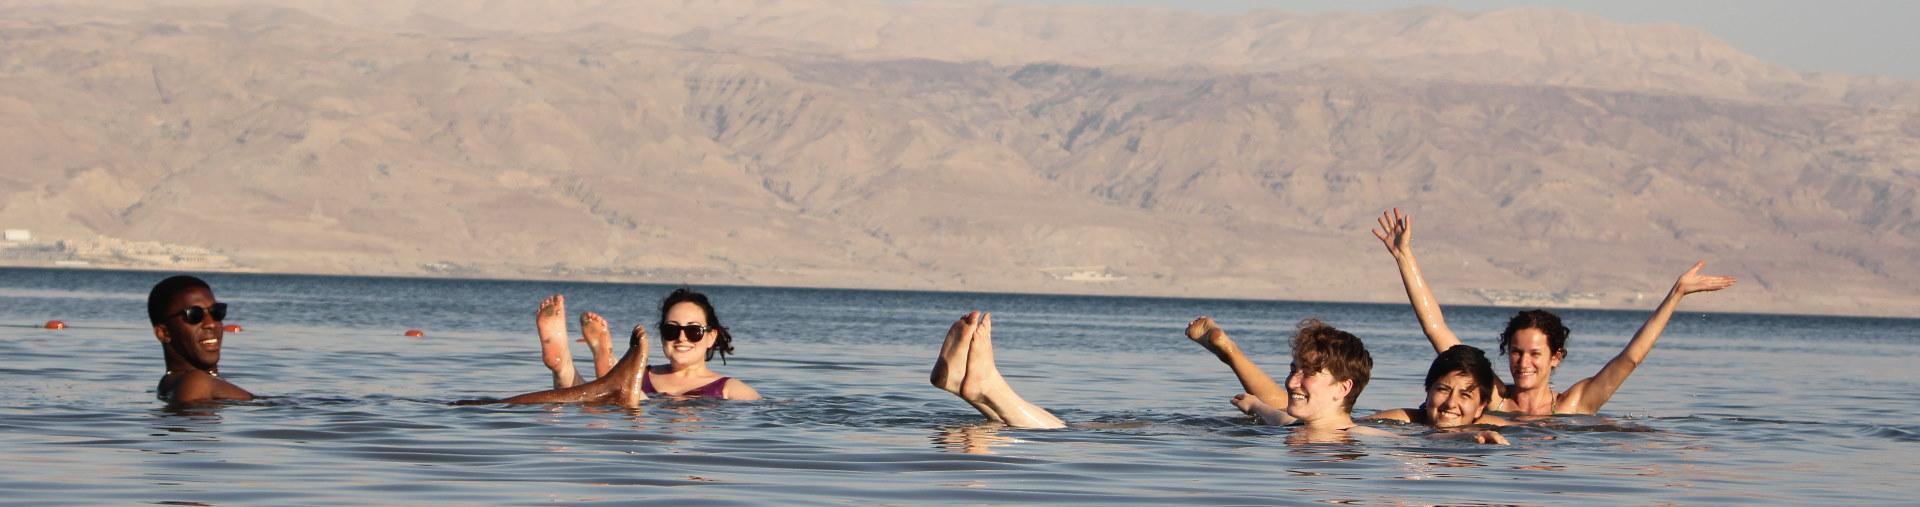 Float in the Dead Sea tour from jerusalem